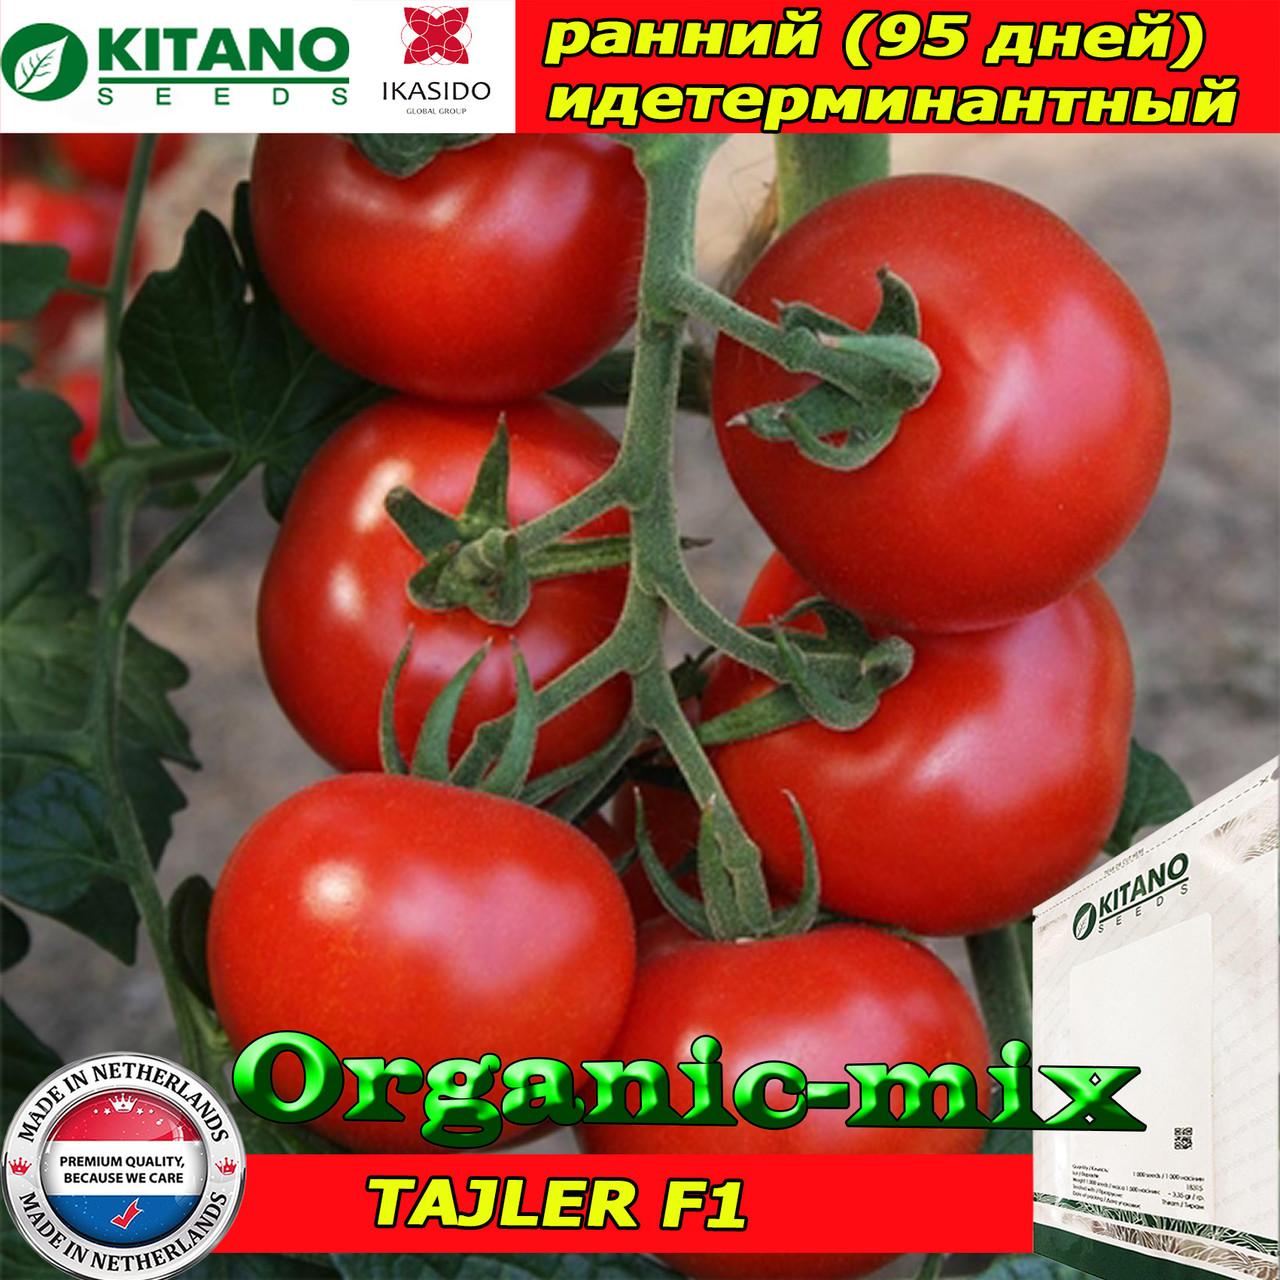 Семена, томат красный ТАЙЛЕР F1 / TAJLER F1, 1000 семян, ТМ Kitano Seeds,